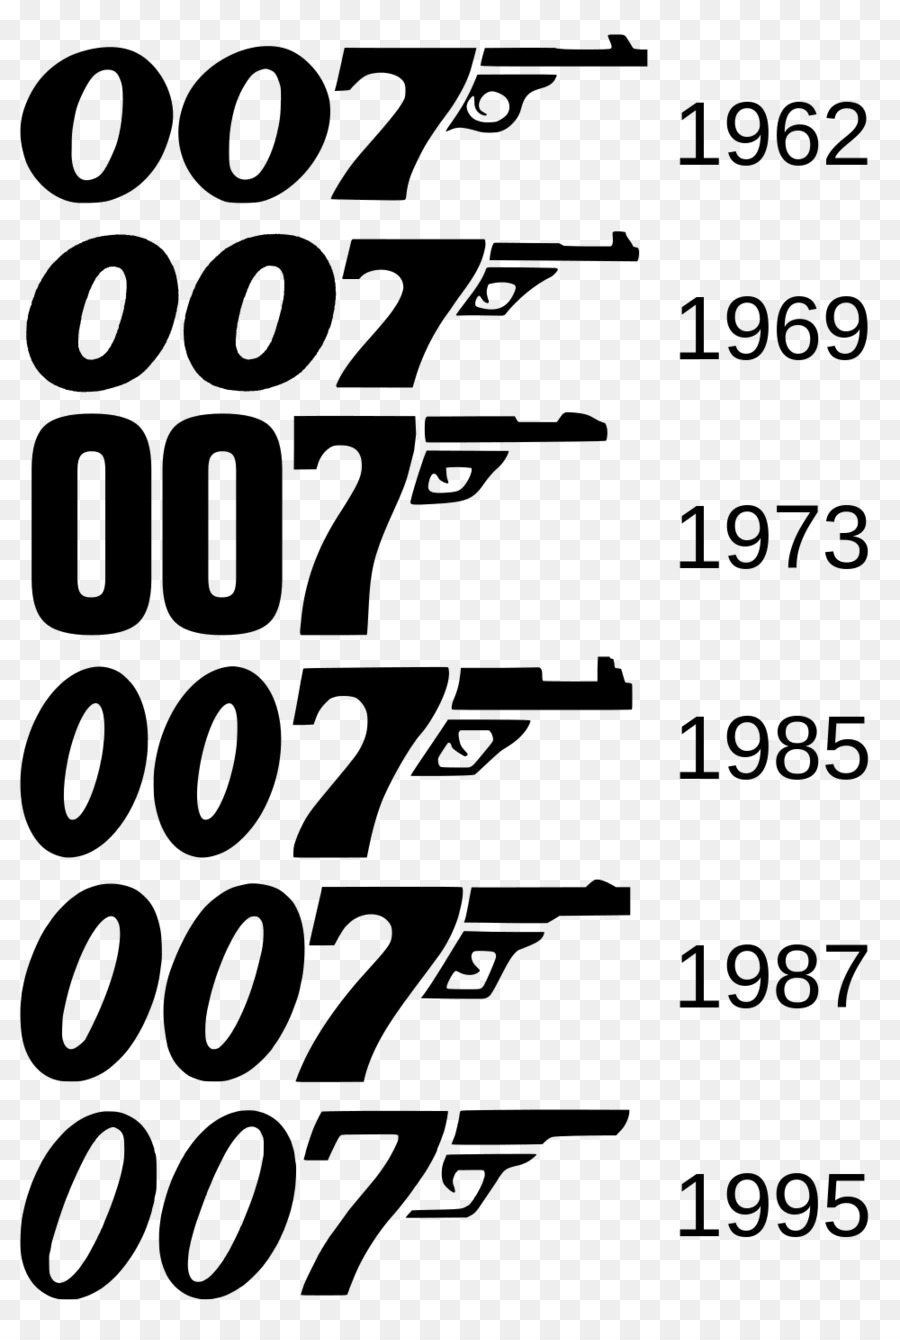 James Bond Film Series Logo The James Bond Bedside Companion The Battle for  Bond - bond